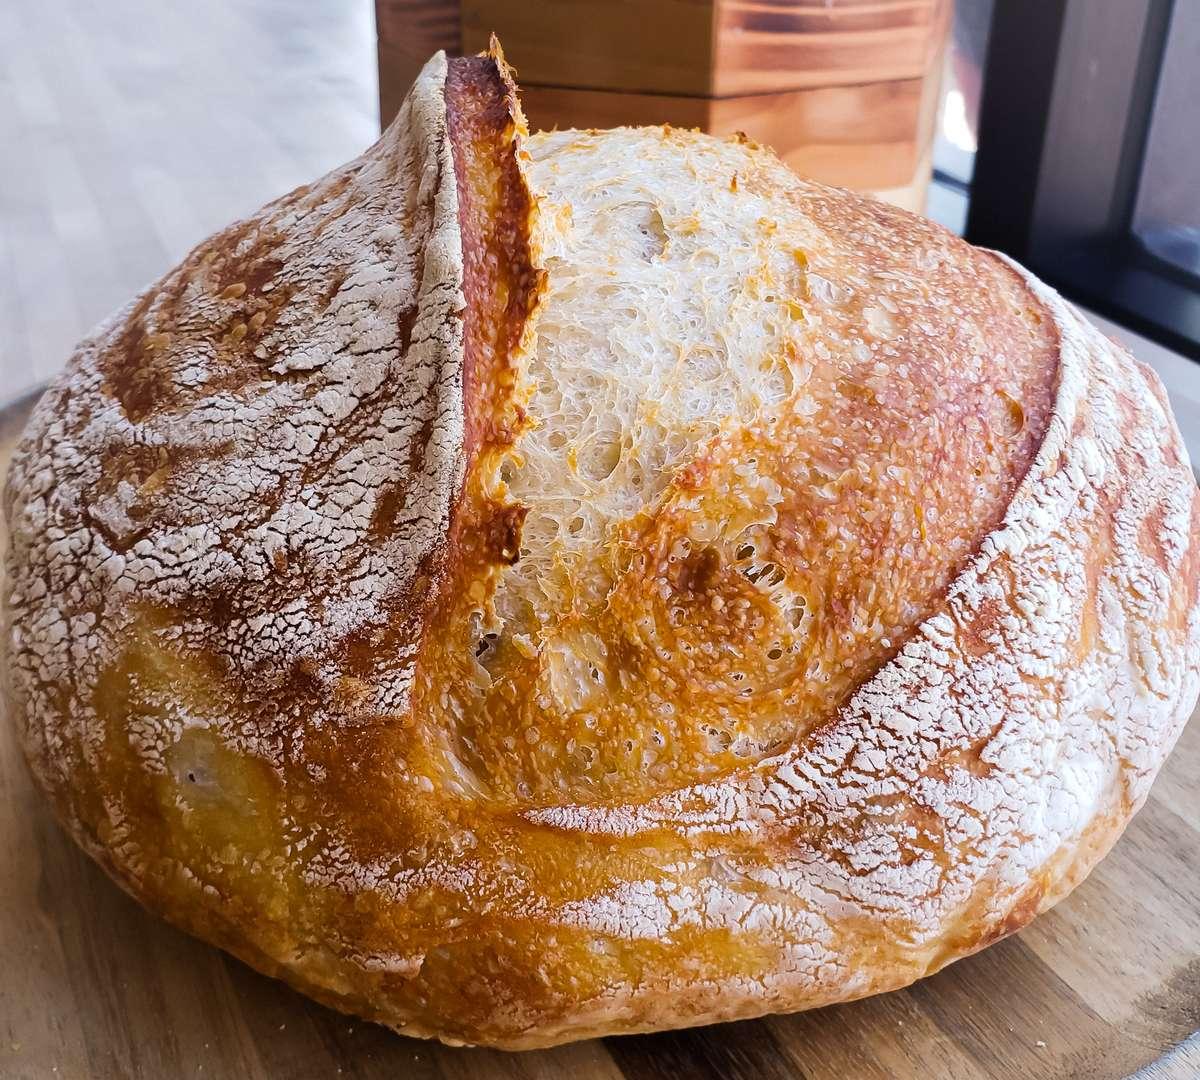 Bread - House-Baked Sourdough Boule